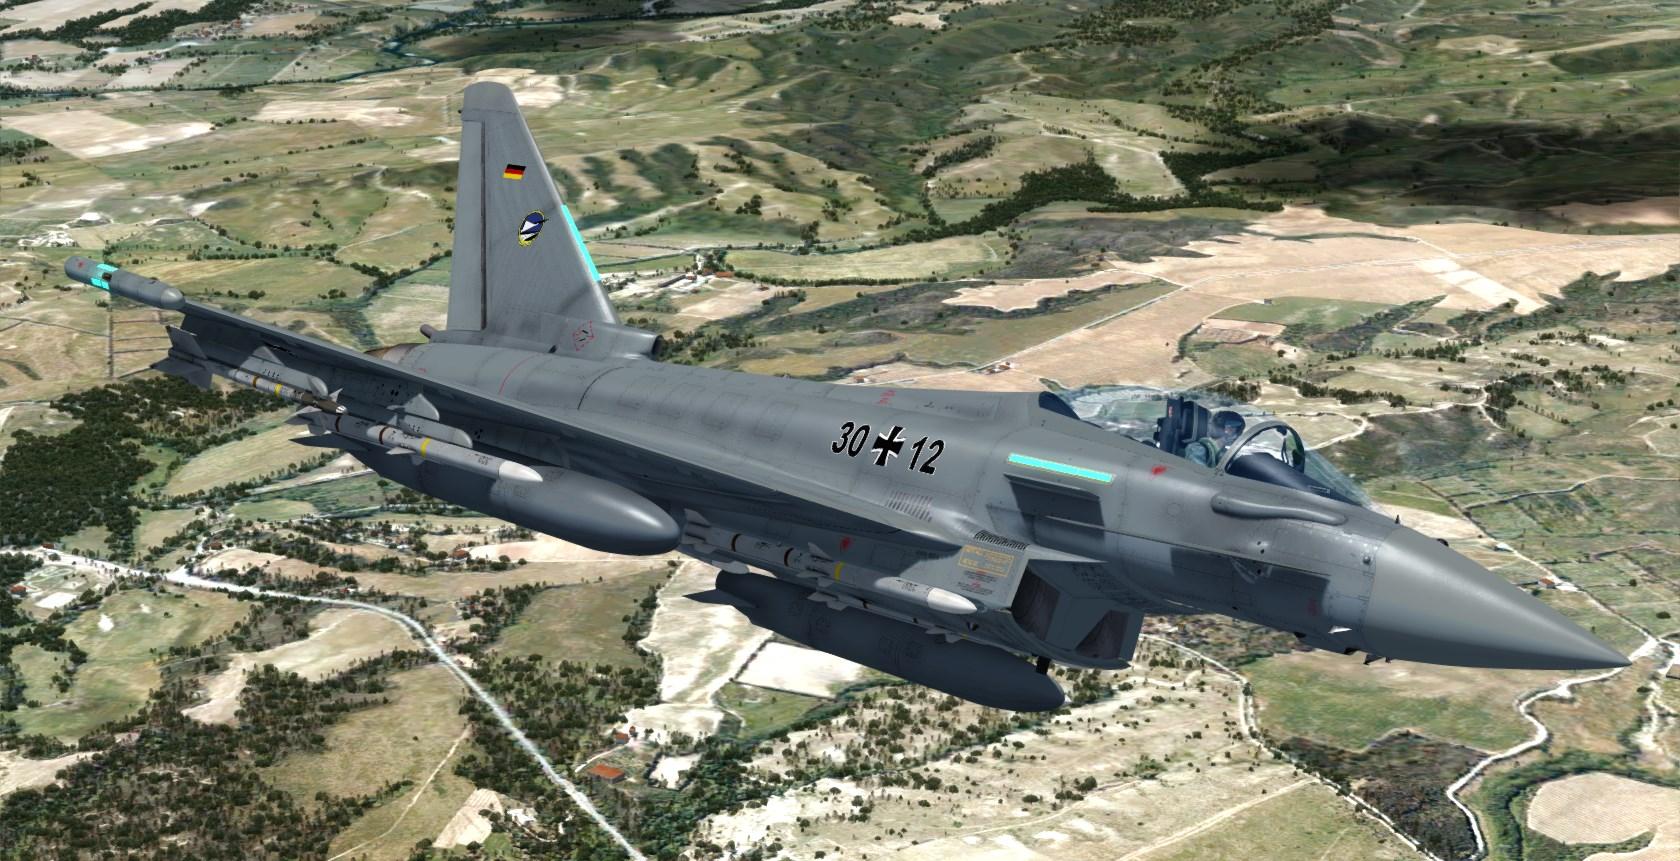 IndiaFoxtEcho (Dino's) Eurofighter Typhoon released